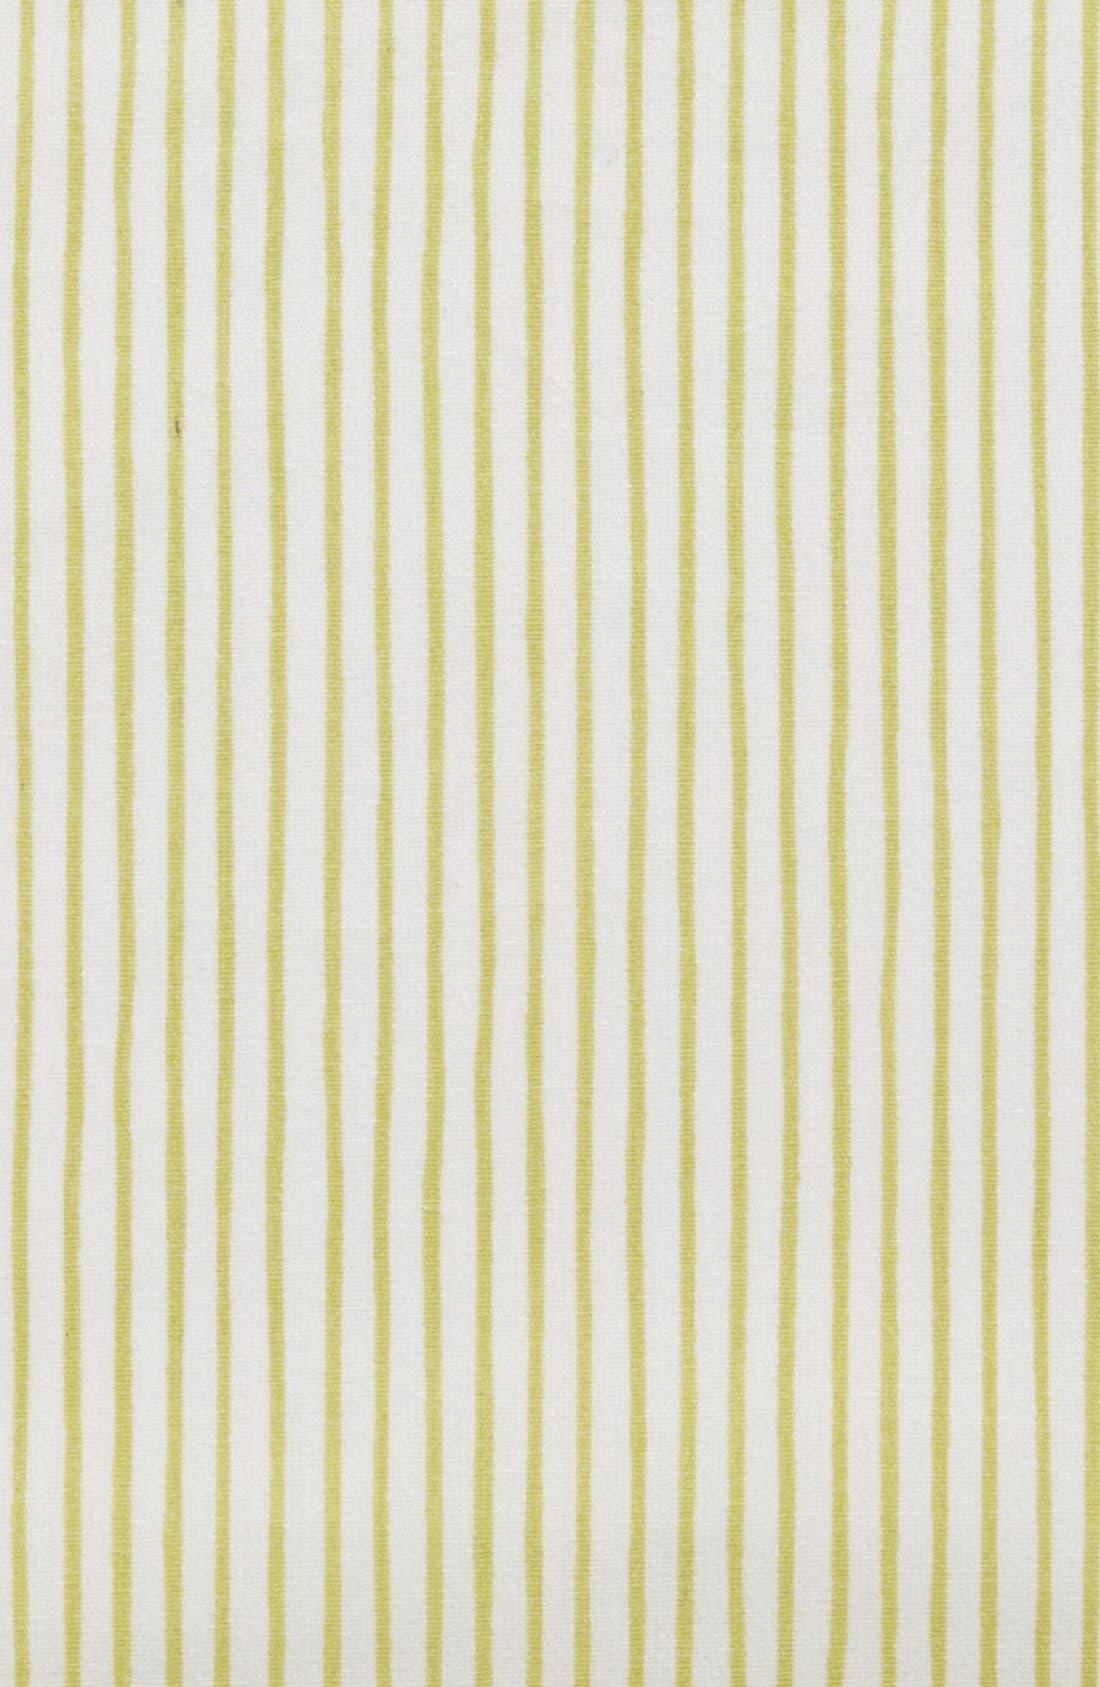 PEHR,                             Pencil Stripe Crib Sheet,                             Alternate thumbnail 2, color,                             300